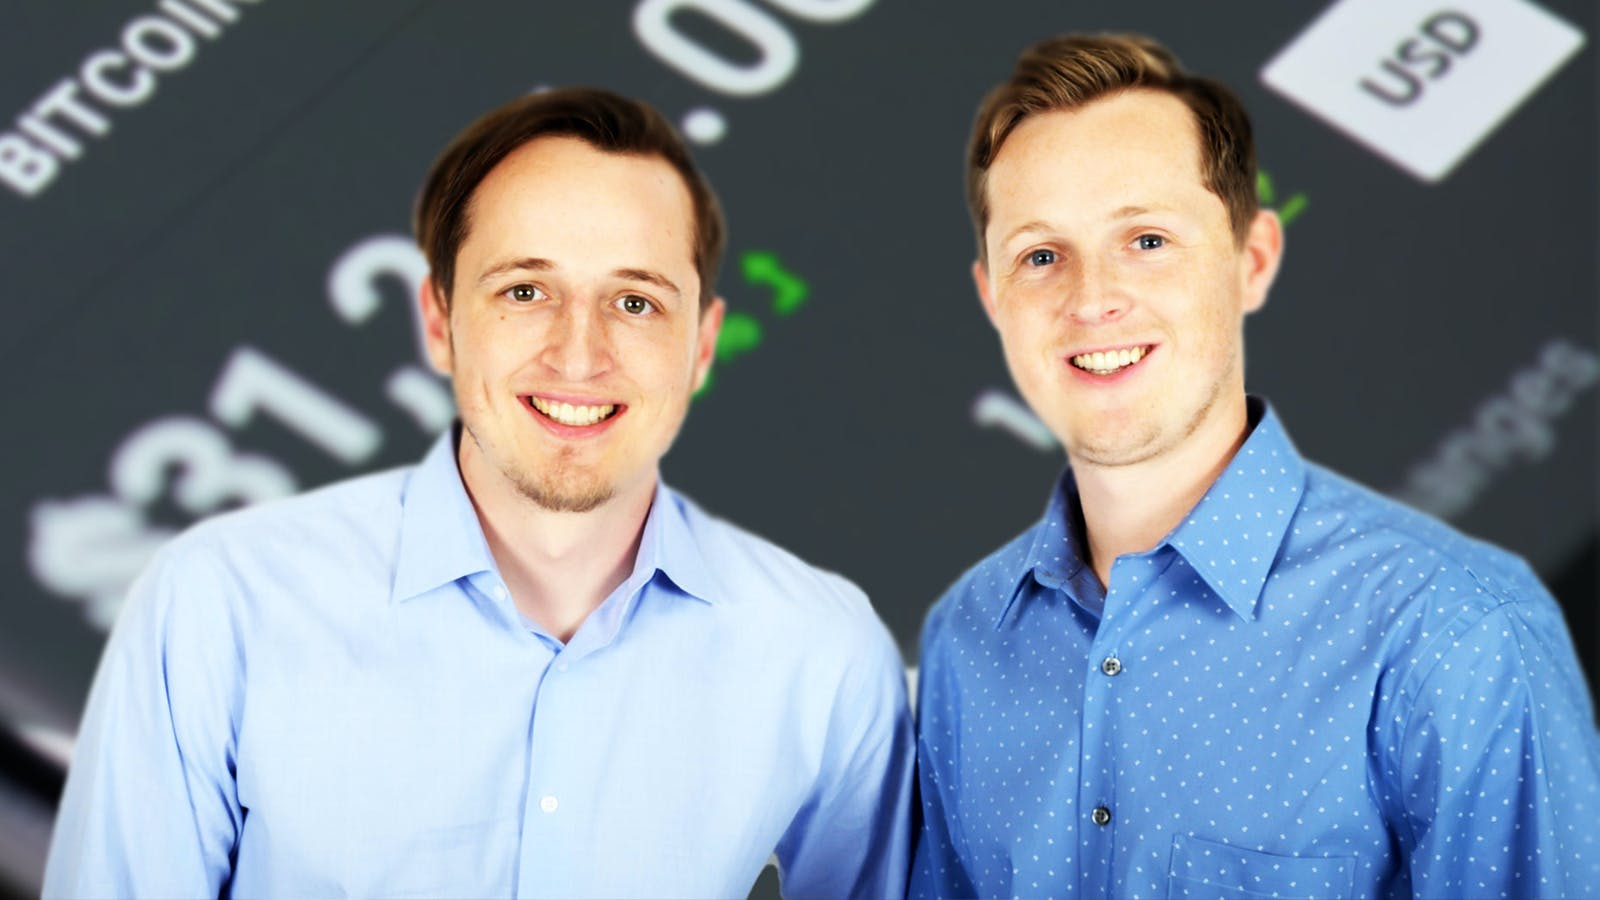 TaxBit co-founders Justin Woodward (left) and Austin Woodward (right). Photo: TaxBit, Shutterstock.